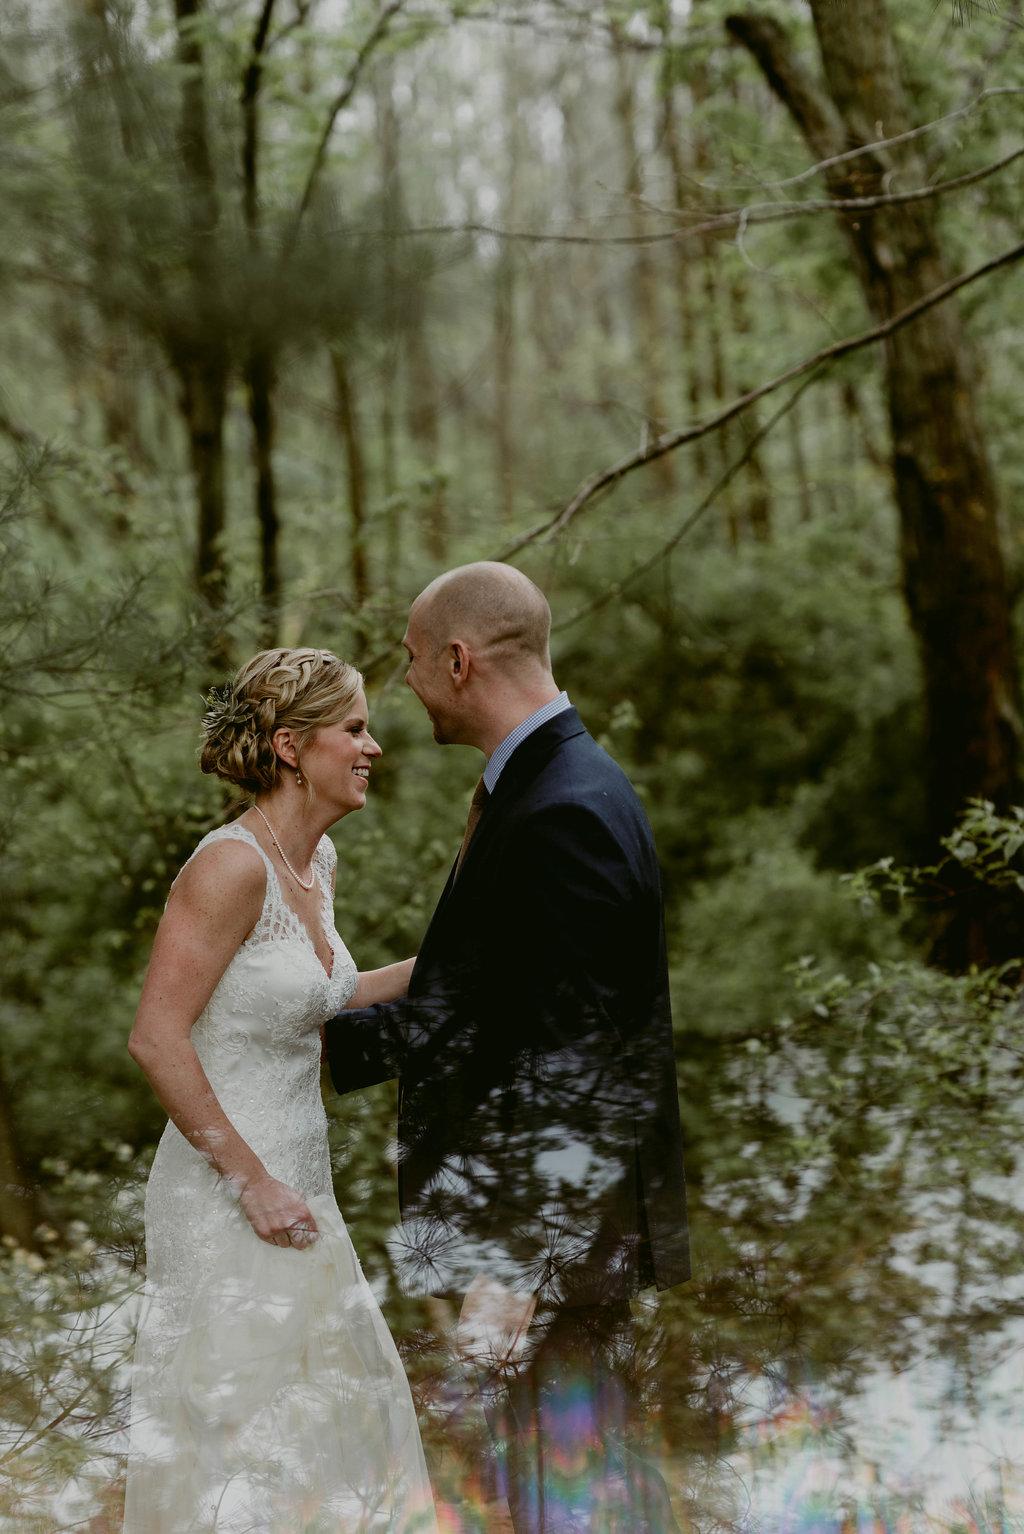 Mandy&Wade-Ohio-Barn-Wedding_MJPHOTO-486.jpg